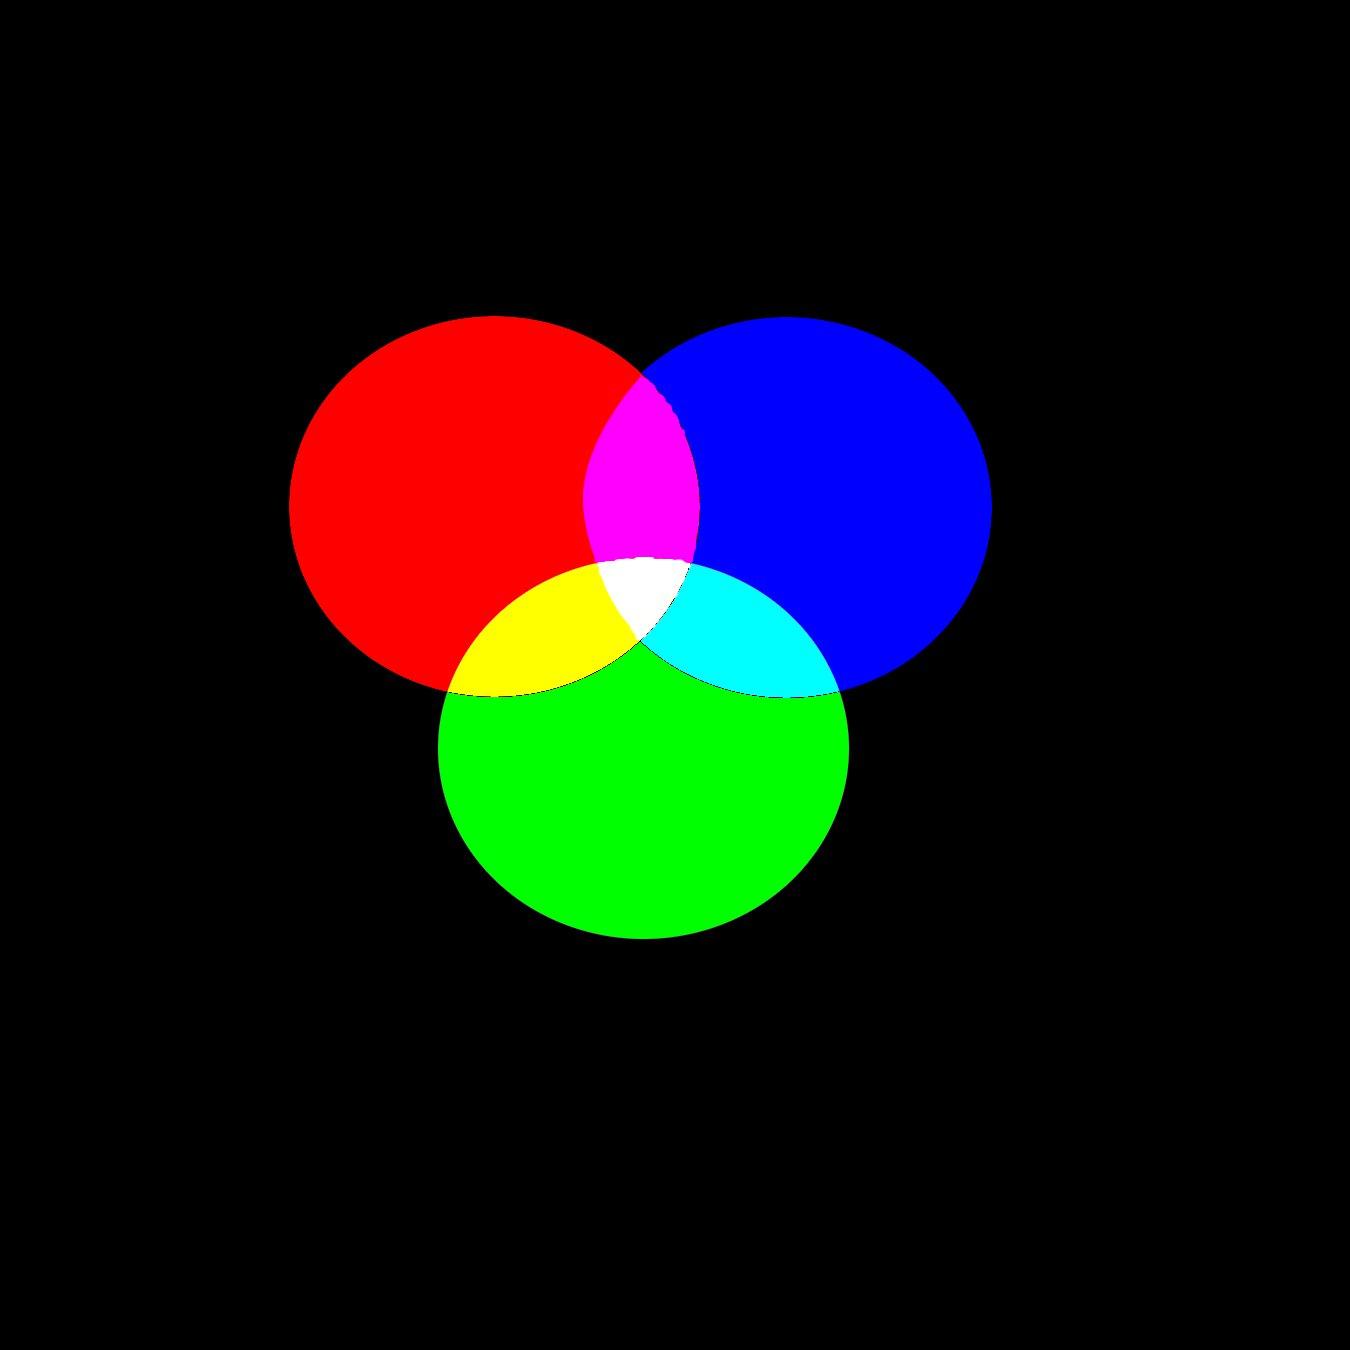 file synth se additive des couleurs primaires de la lumi wikimedia commons. Black Bedroom Furniture Sets. Home Design Ideas